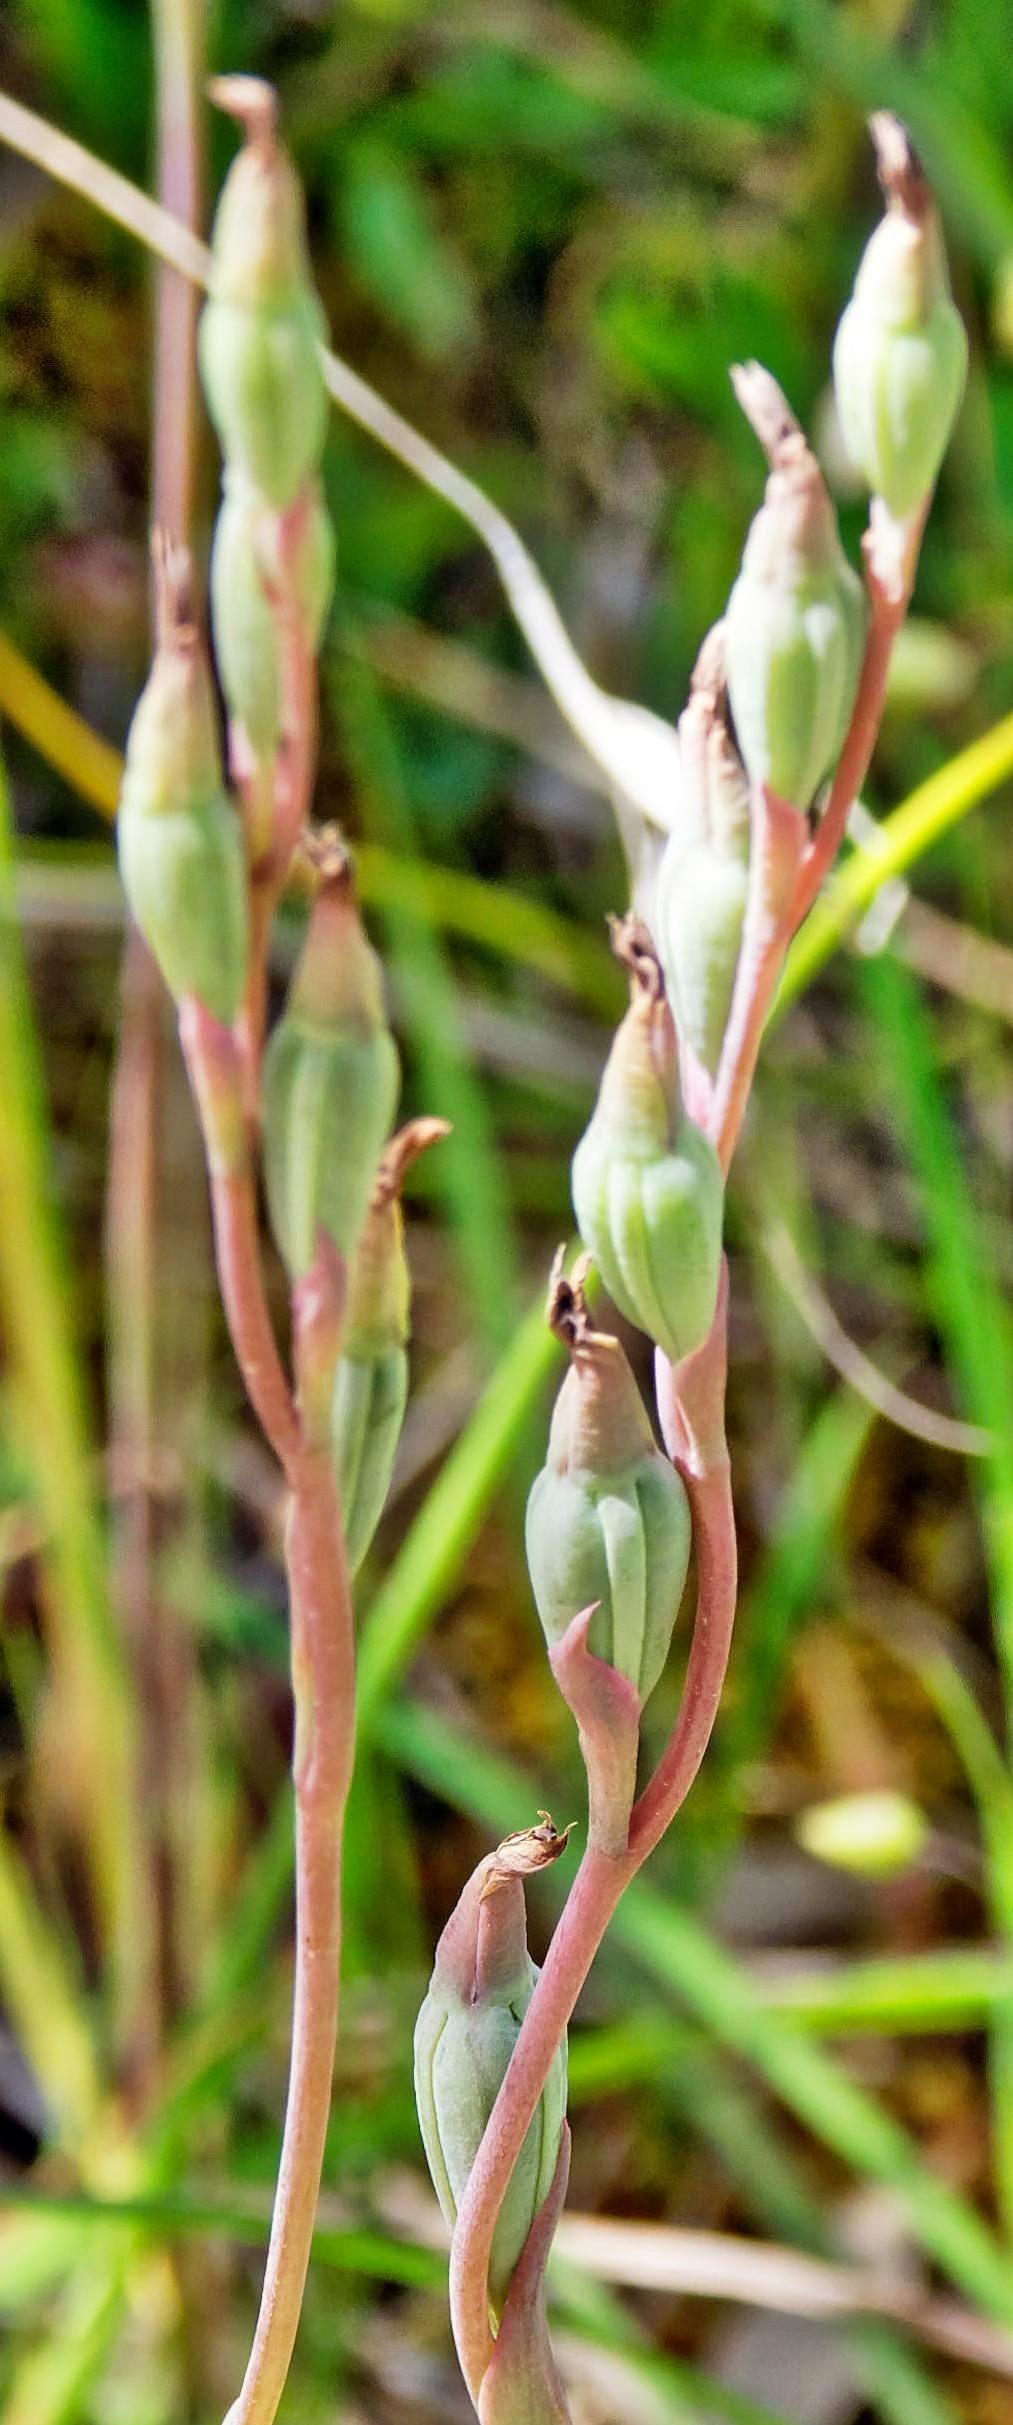 Thelymitra-pauciflora-1-detail.jpeg